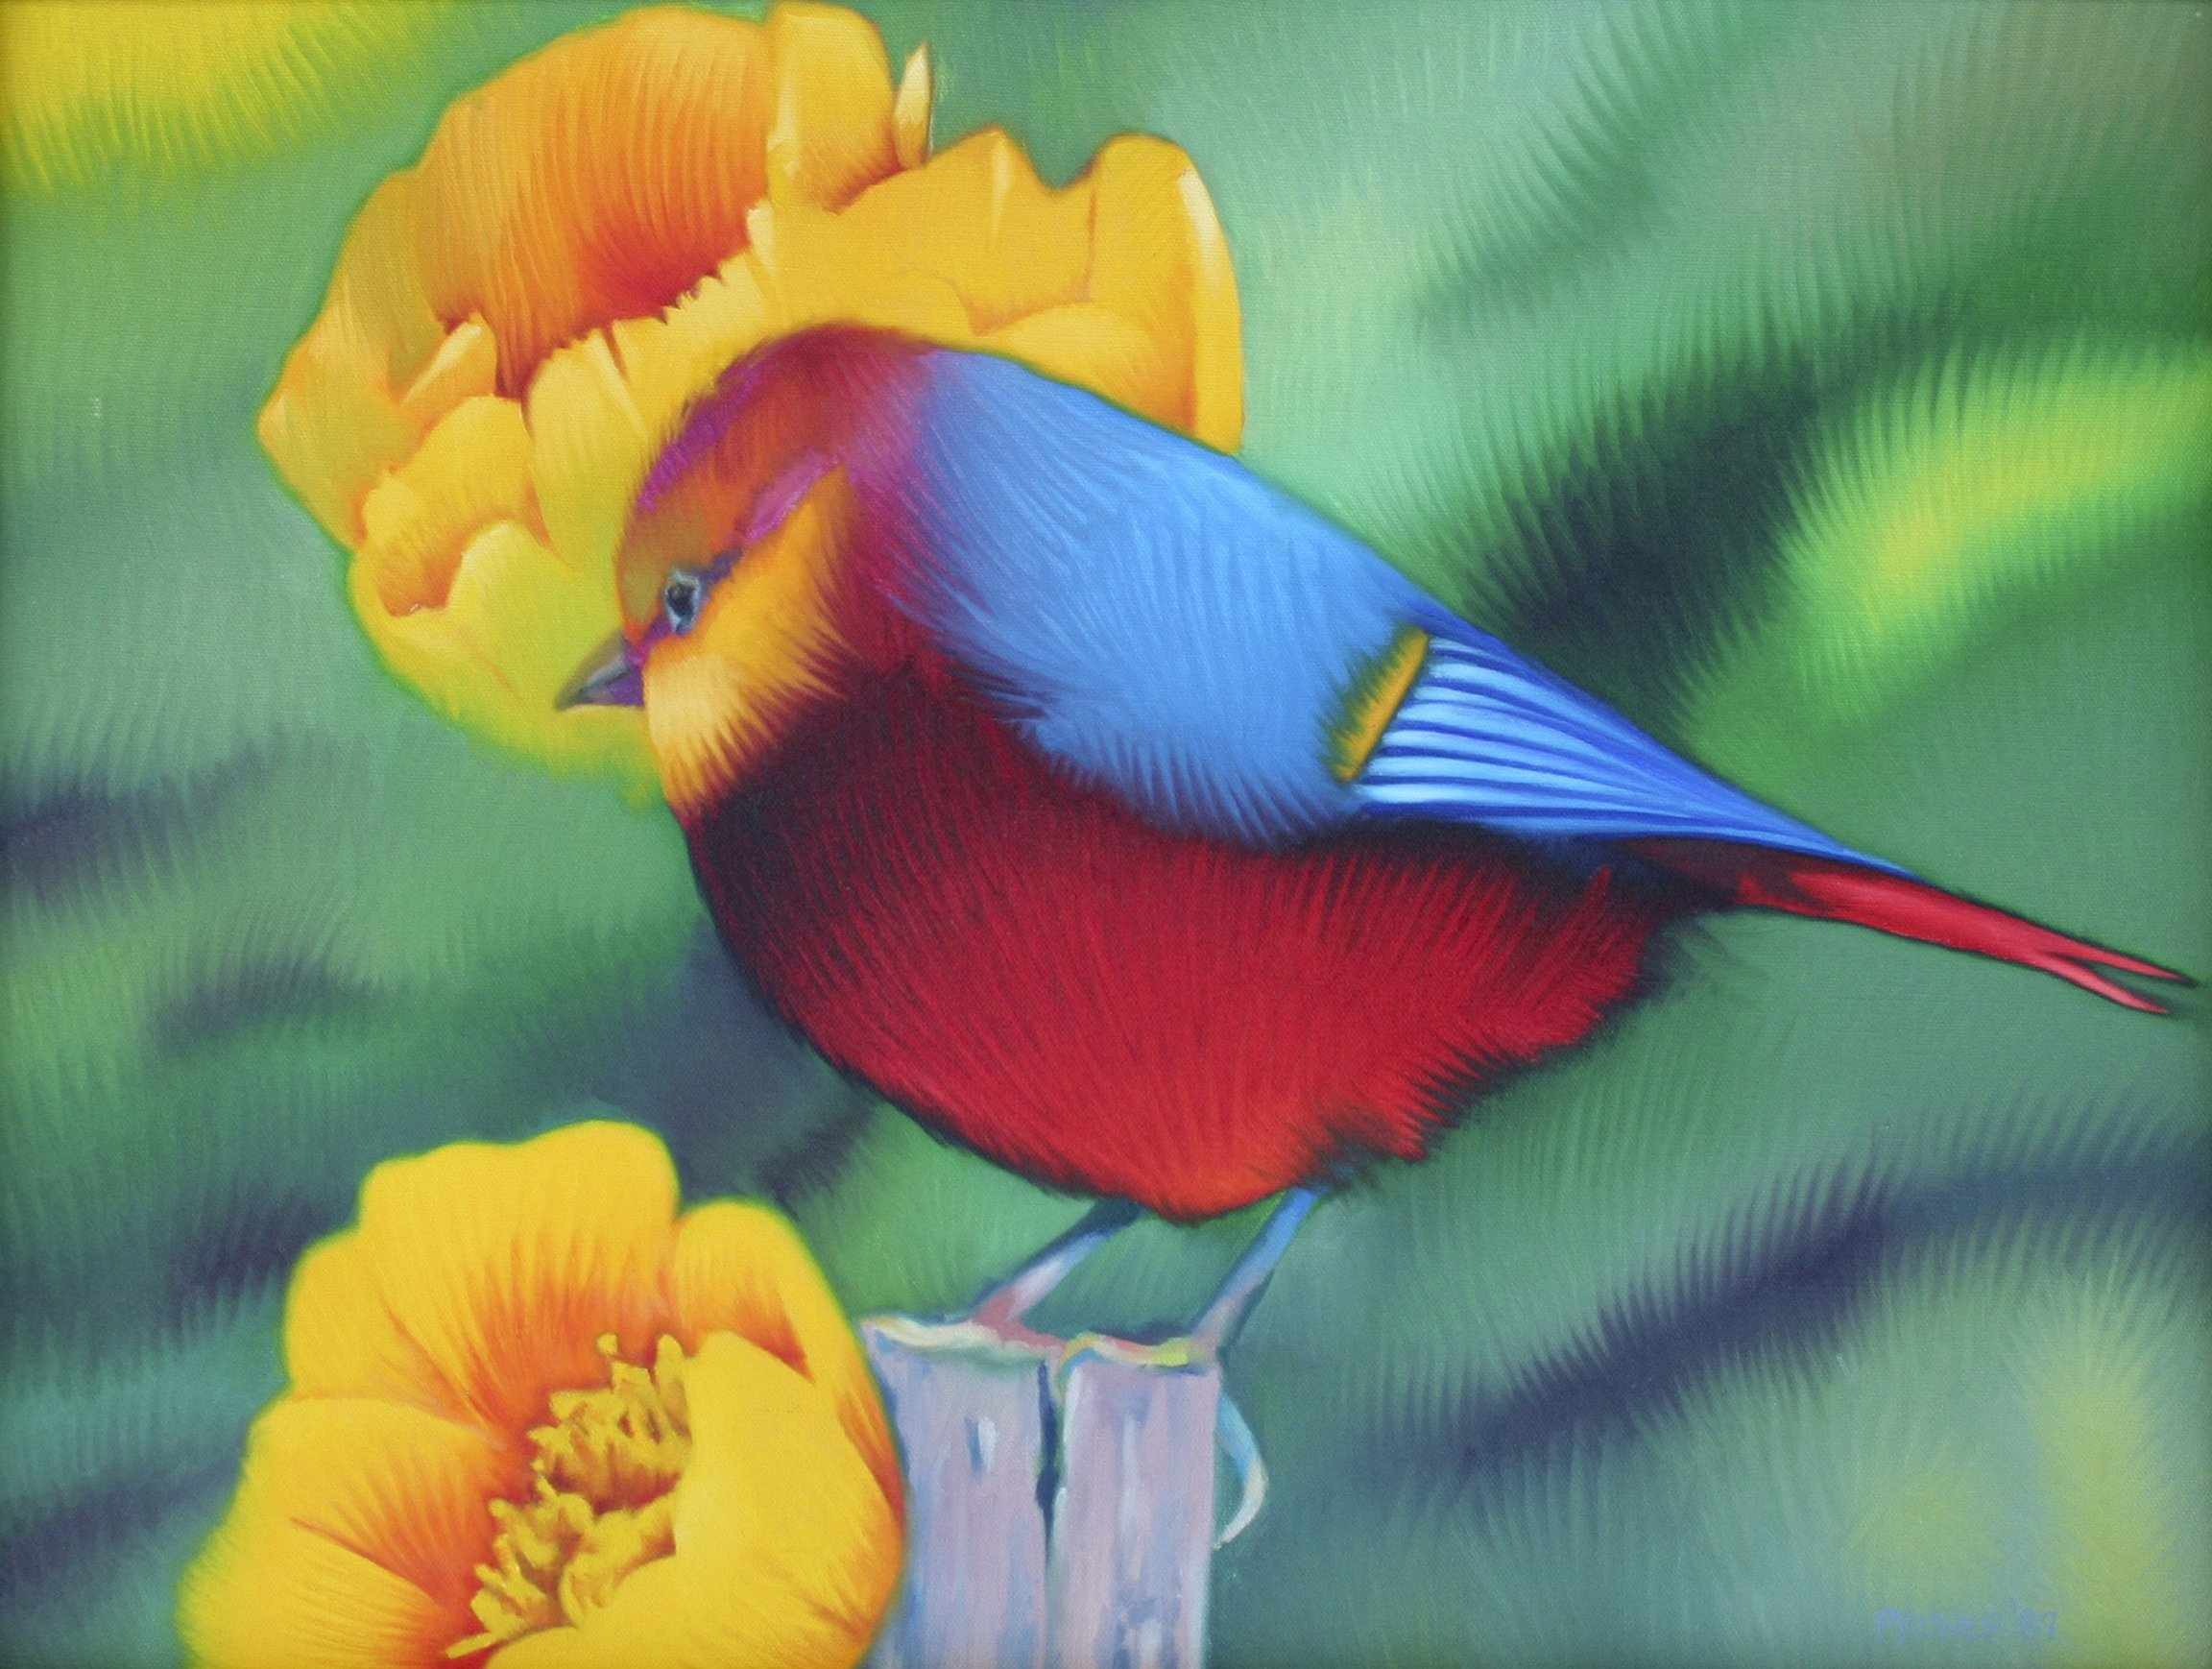 Pruner, Gary – #127 Bird Yellow Flower